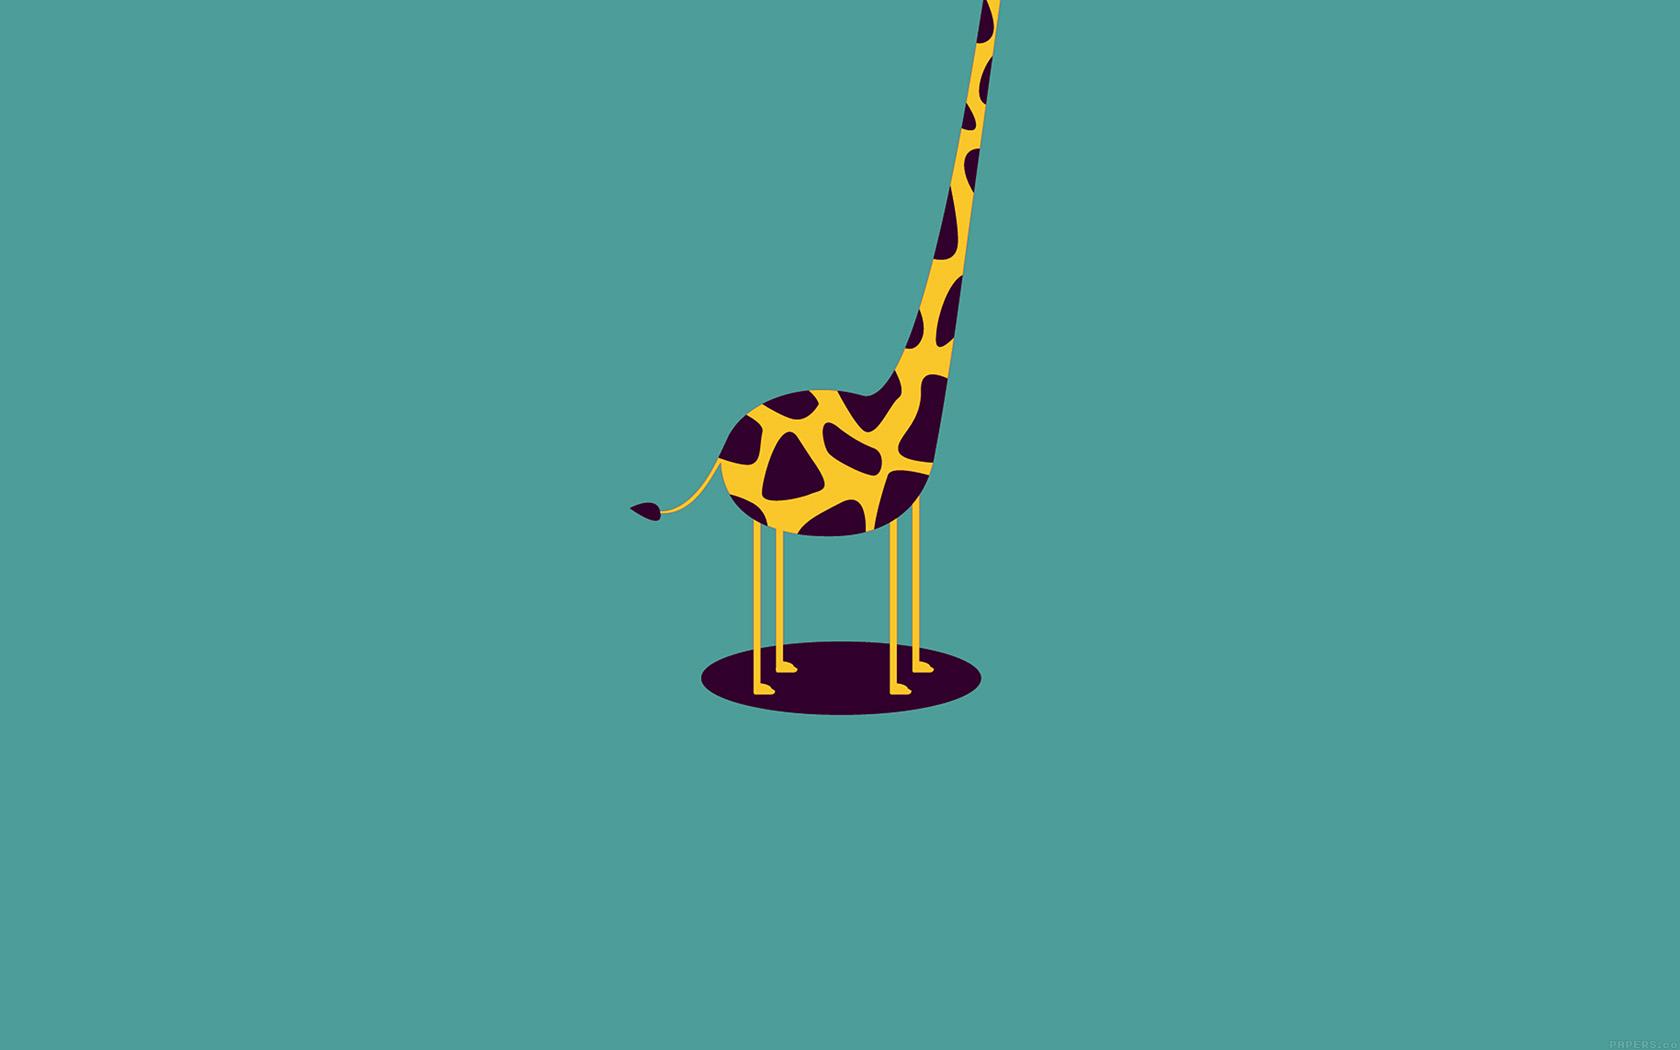 Street Bike Girl Wallpapers Ag52 Giraffe Cute Blue Minimal Simple Wallpaper